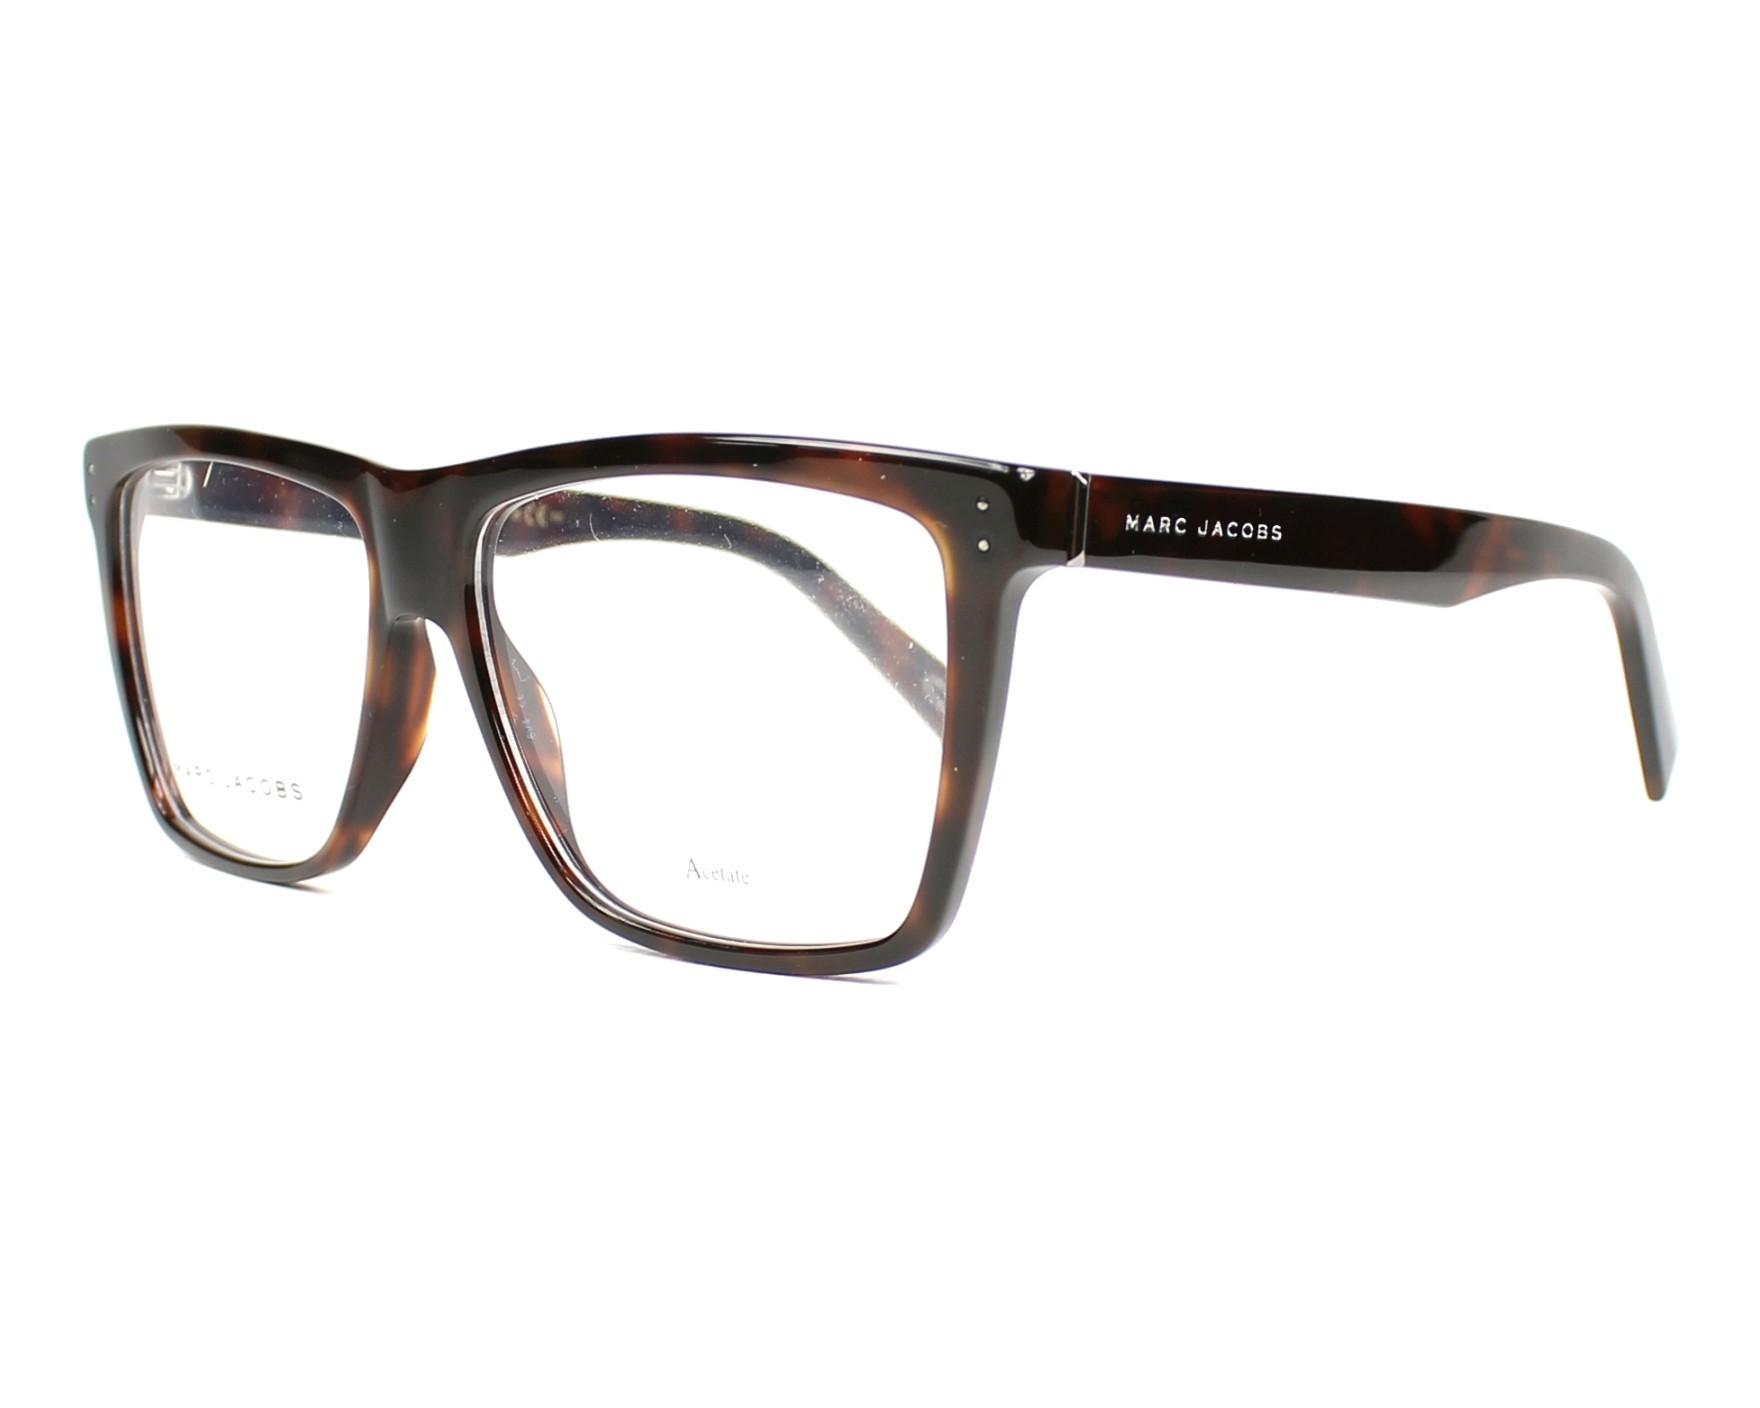 marc jacobs eyeglasses marc 124 zy1 havana visio. Black Bedroom Furniture Sets. Home Design Ideas